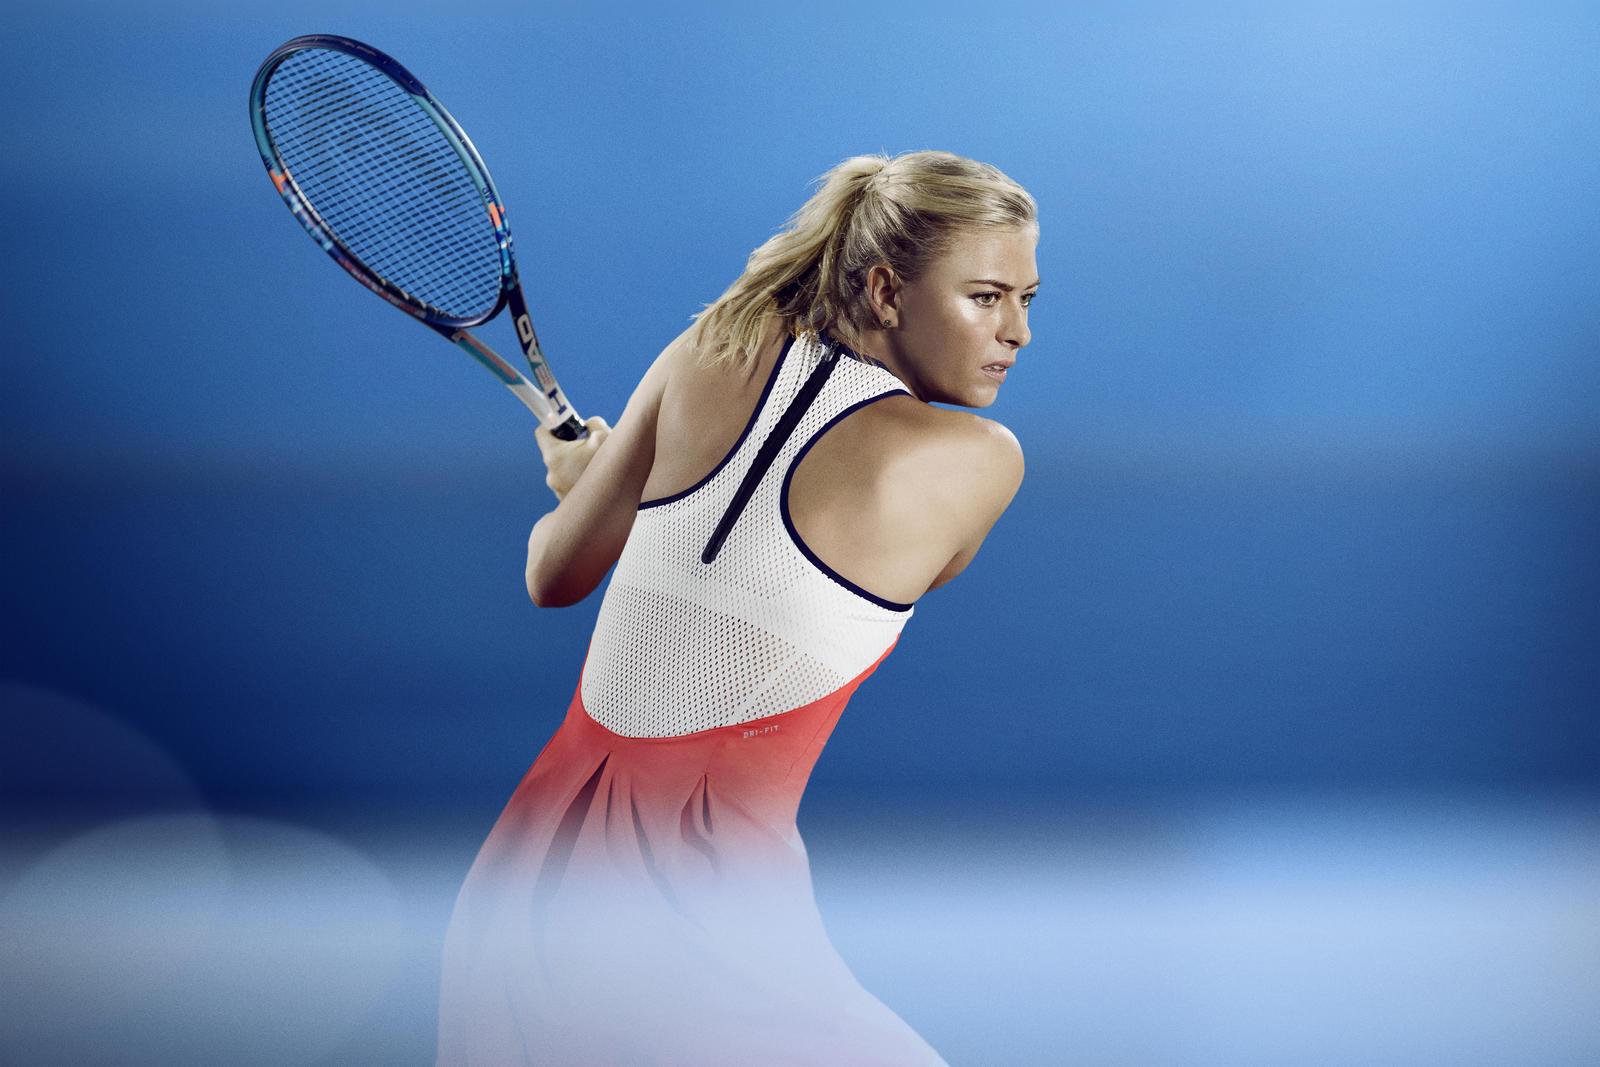 maria sharapova nike tennis outfit australian open 2016